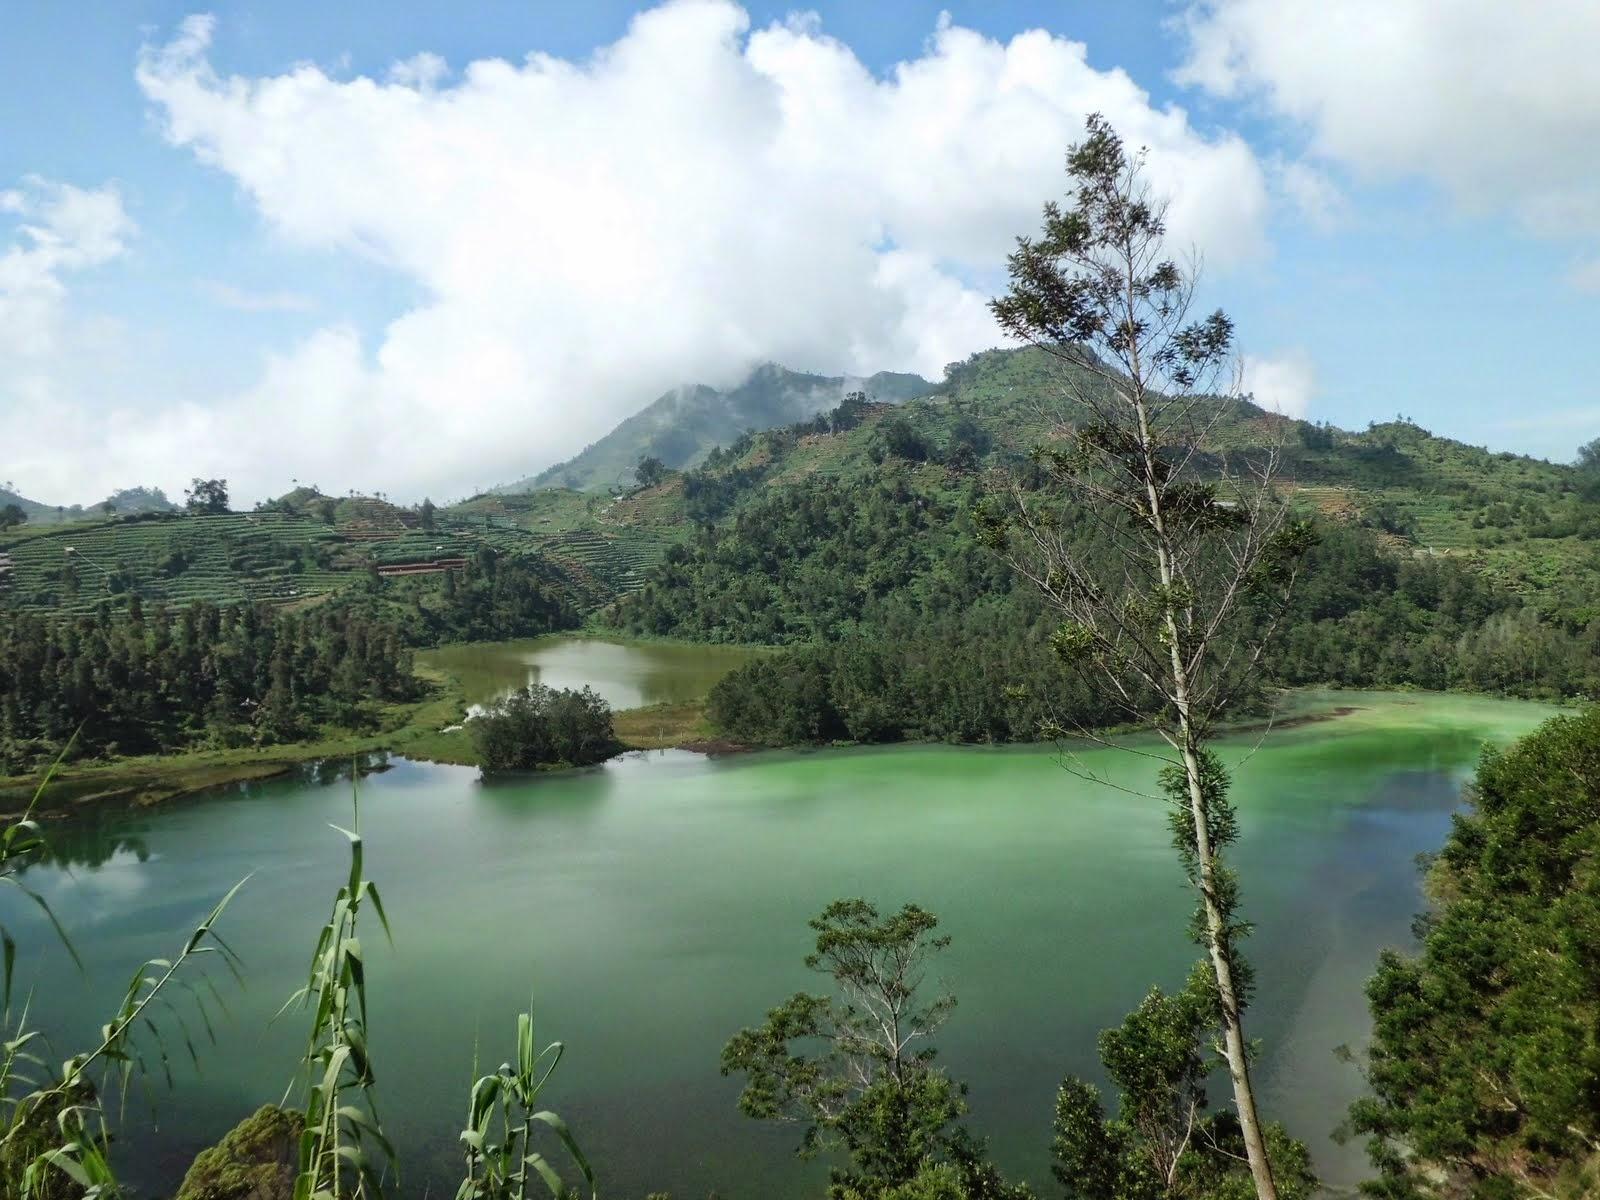 Telaga Warna Obyek Wisata Alam Kab. Bogor - BINARnews ...